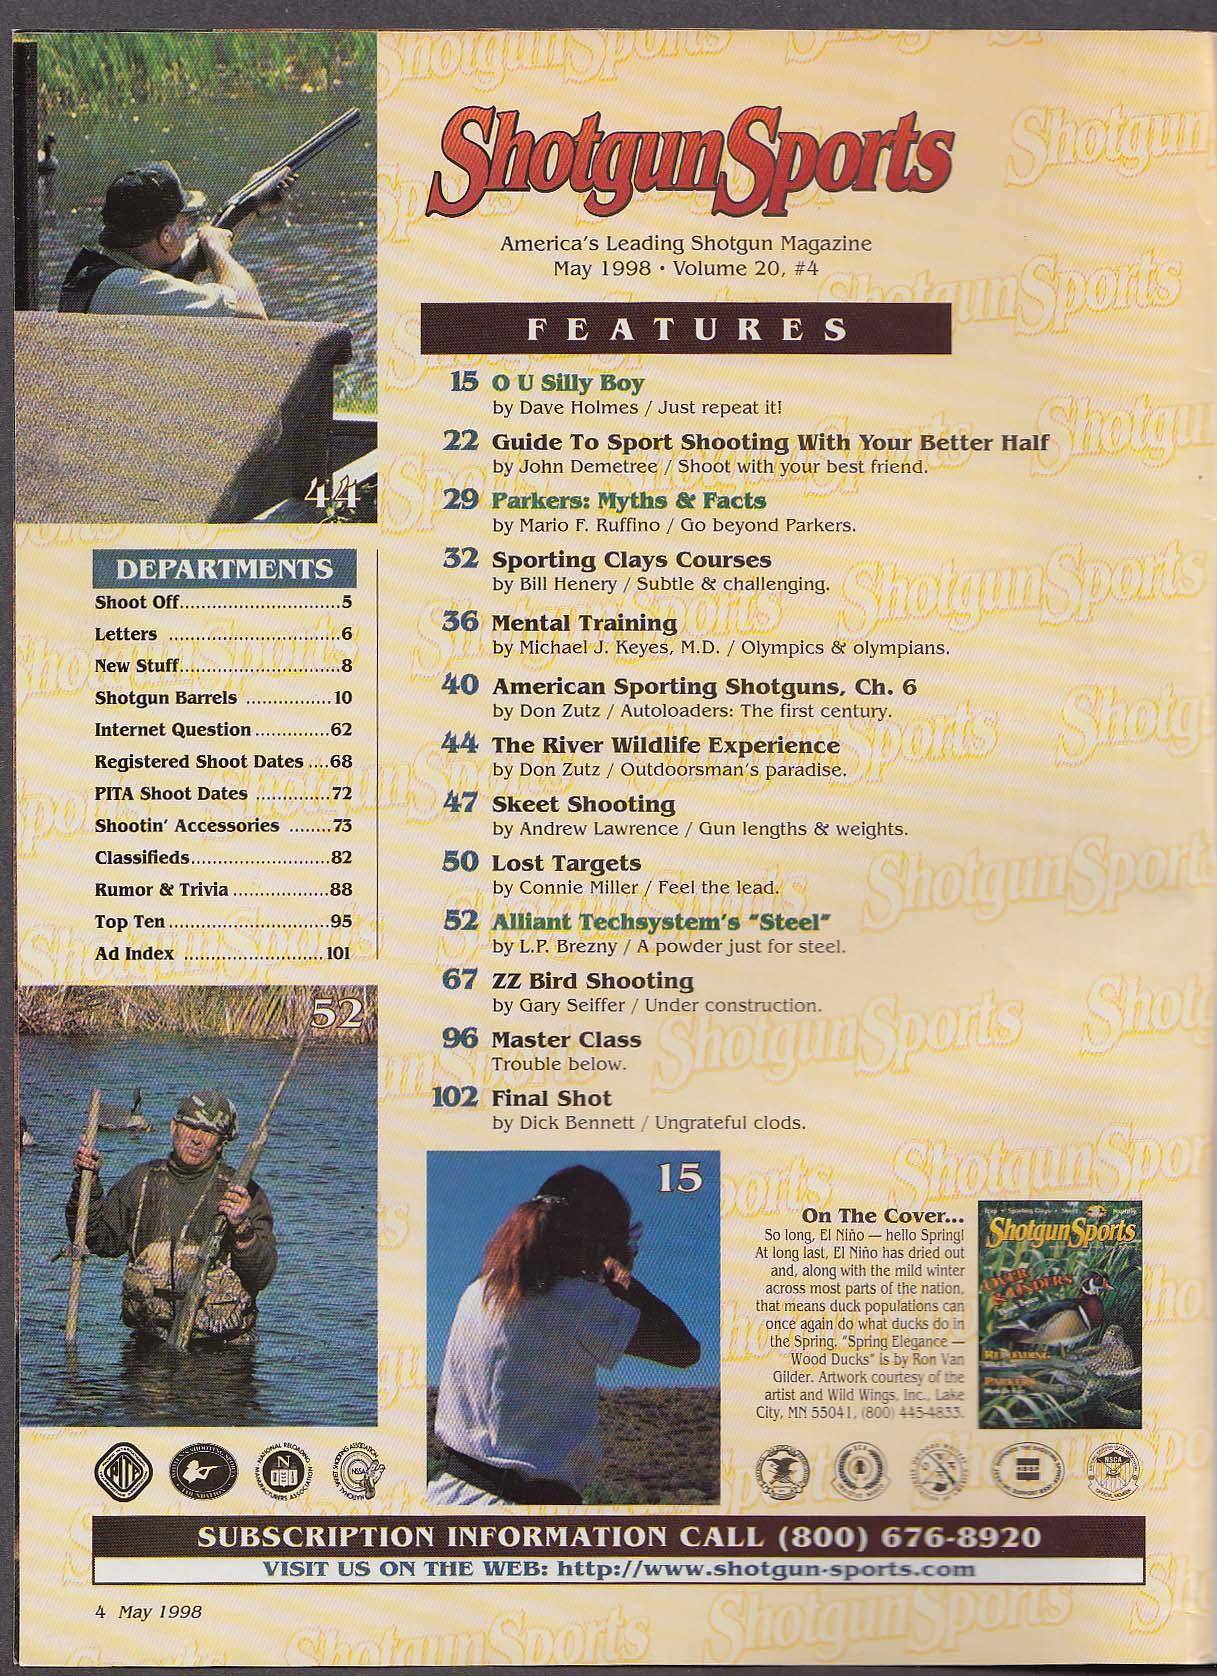 Image for SHOTGUN SPORTS Alliant Techsystem Steel Autoloaders Olympics Parker + 5 1998